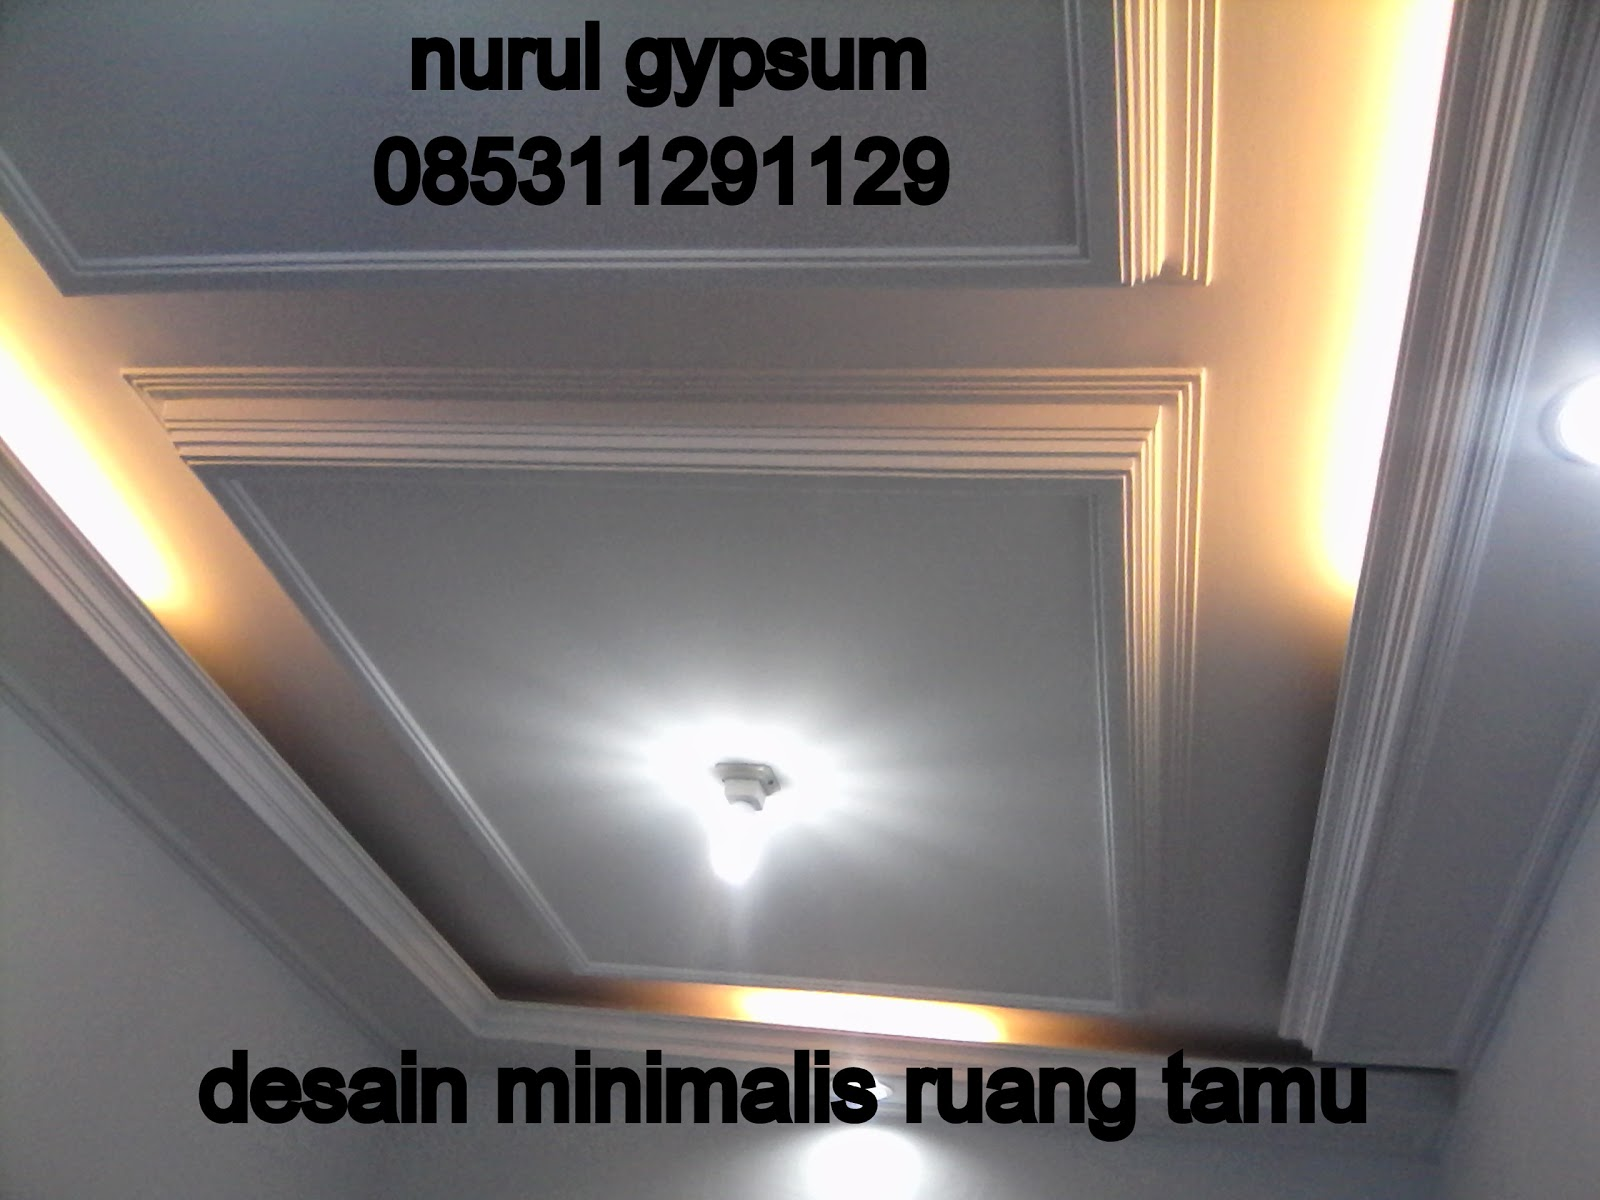 Daftar Harga Pasang Plafon Gypsum Per Meter 087875737328